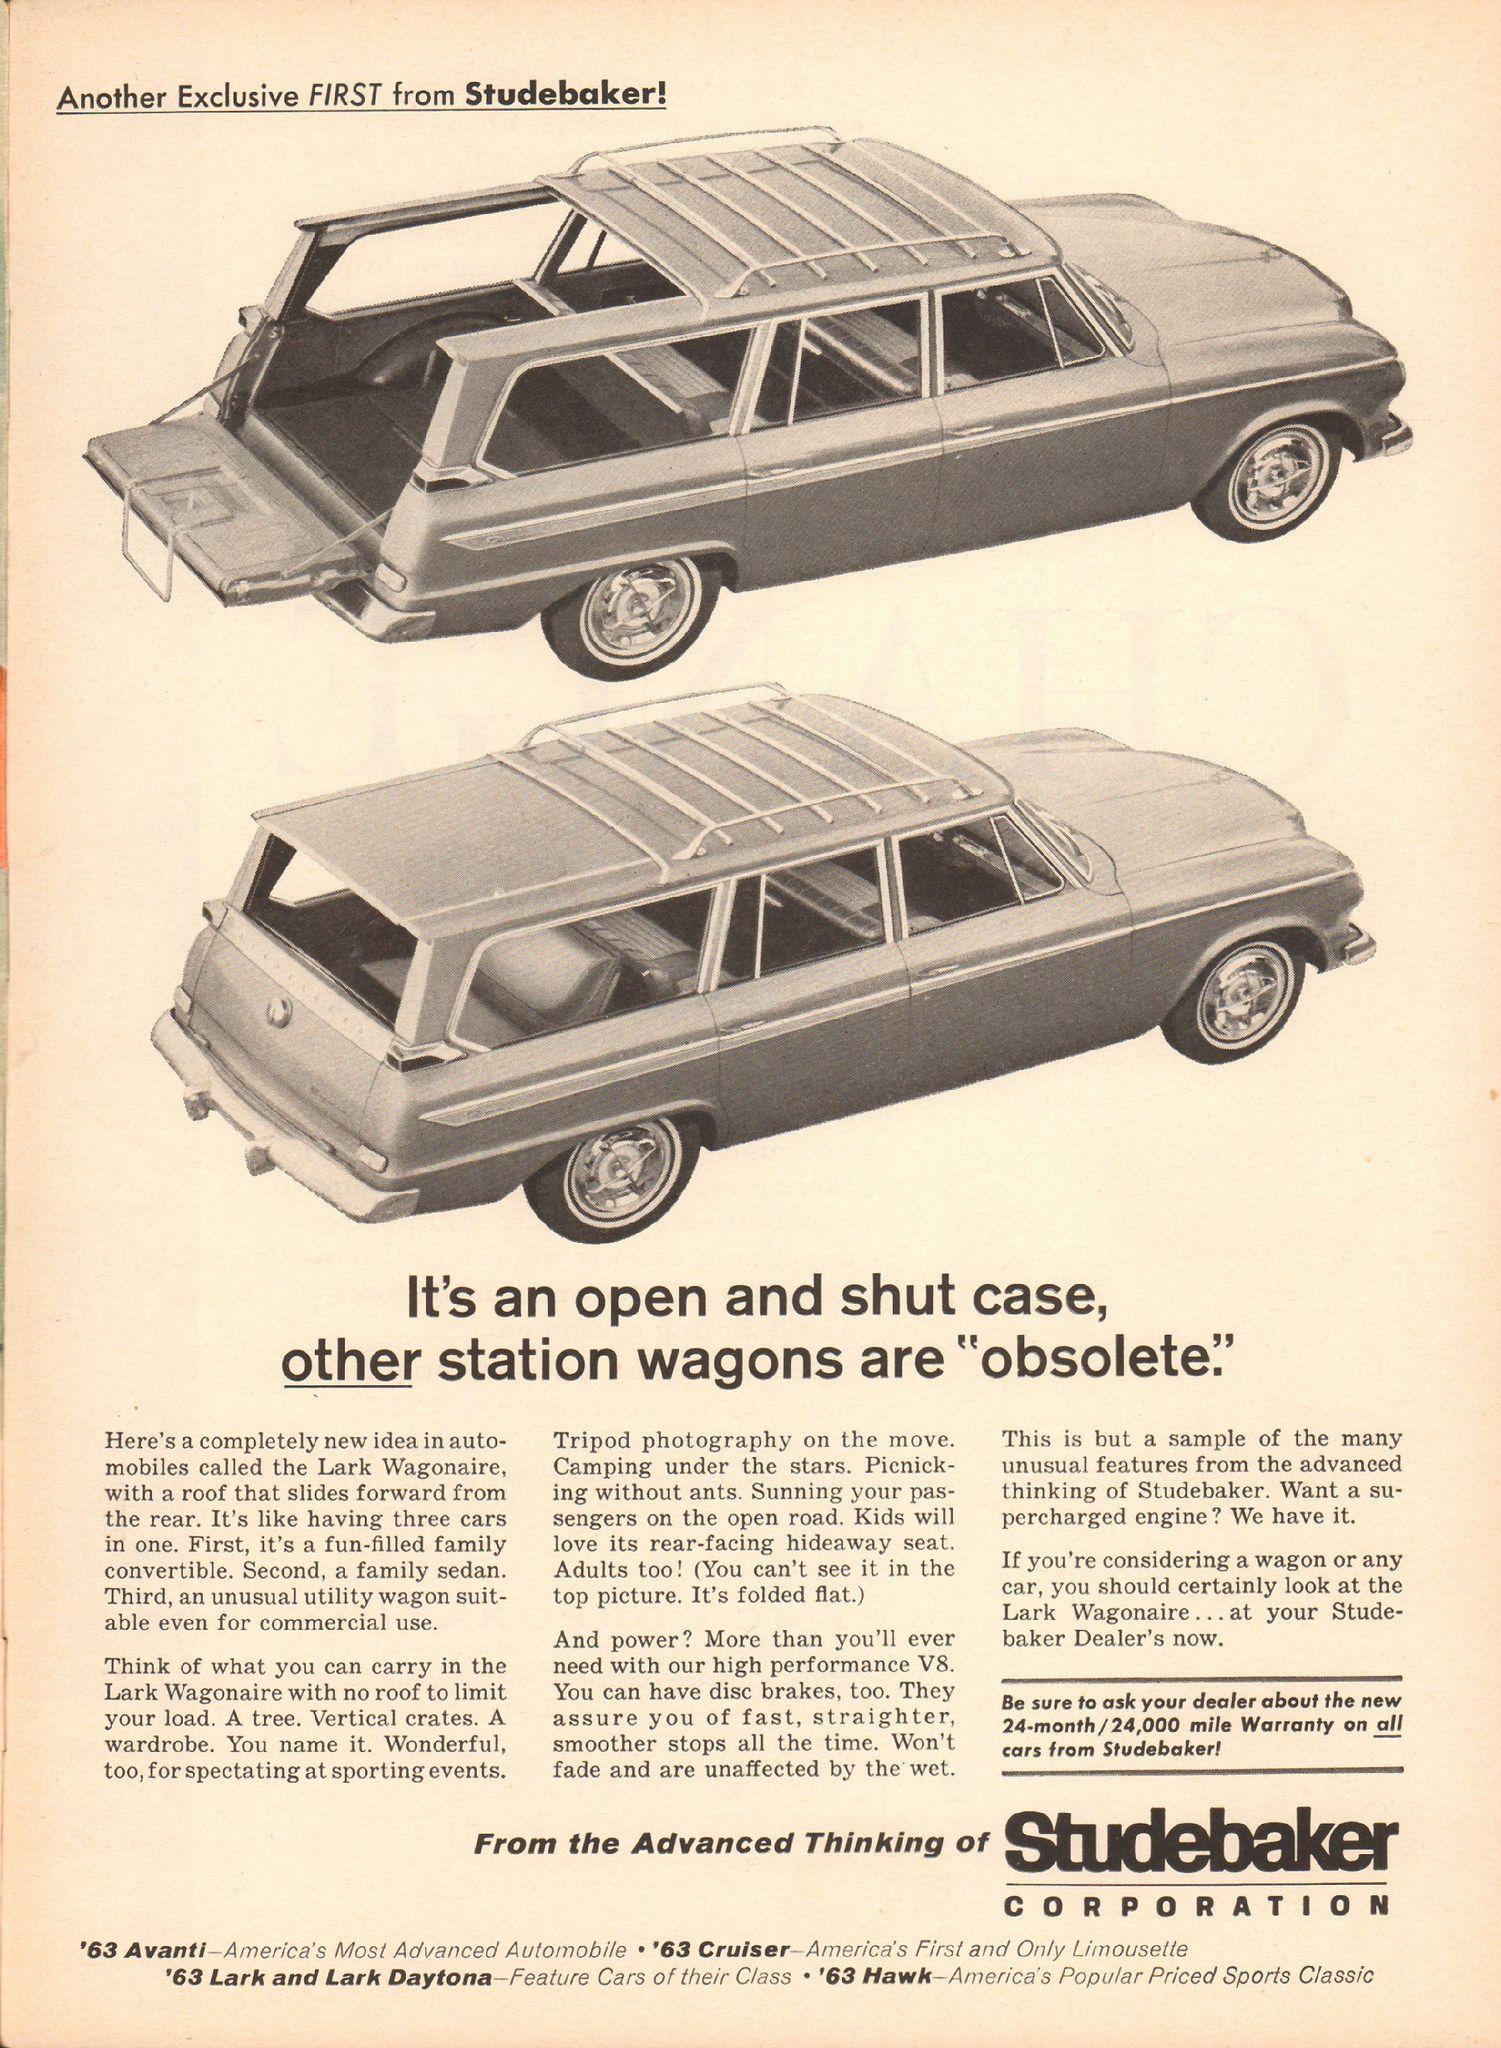 1963 studebaker lark wagonaire advertisement newsweek november 19 1962